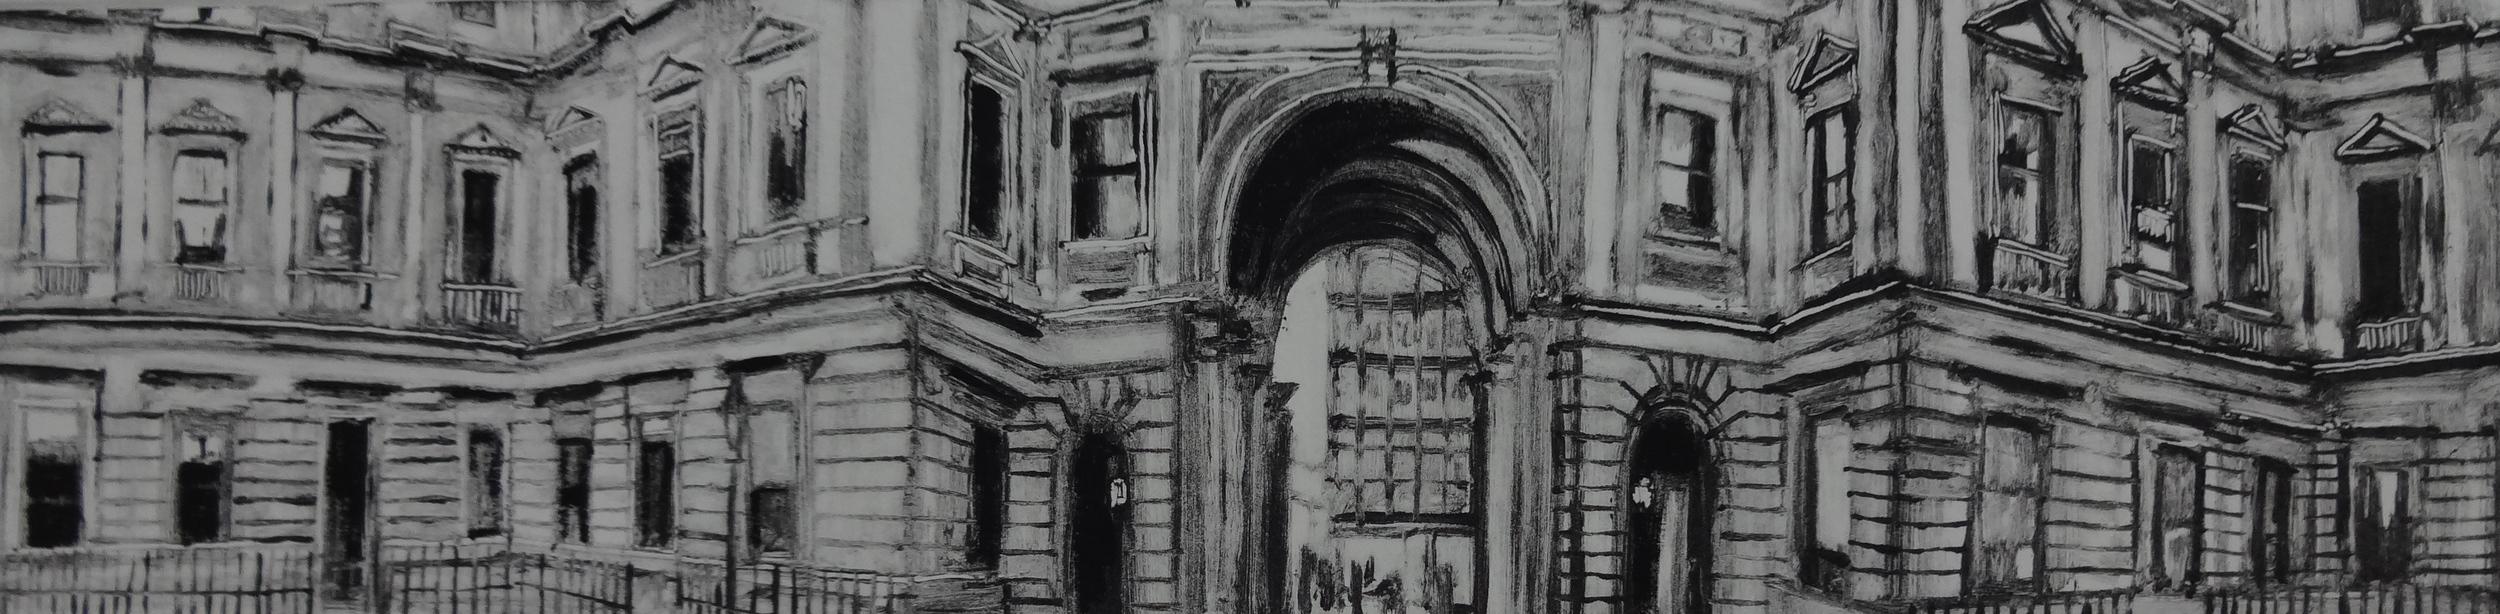 Monotype RA Courtyard 7.5 x 29.5 cm.JPG